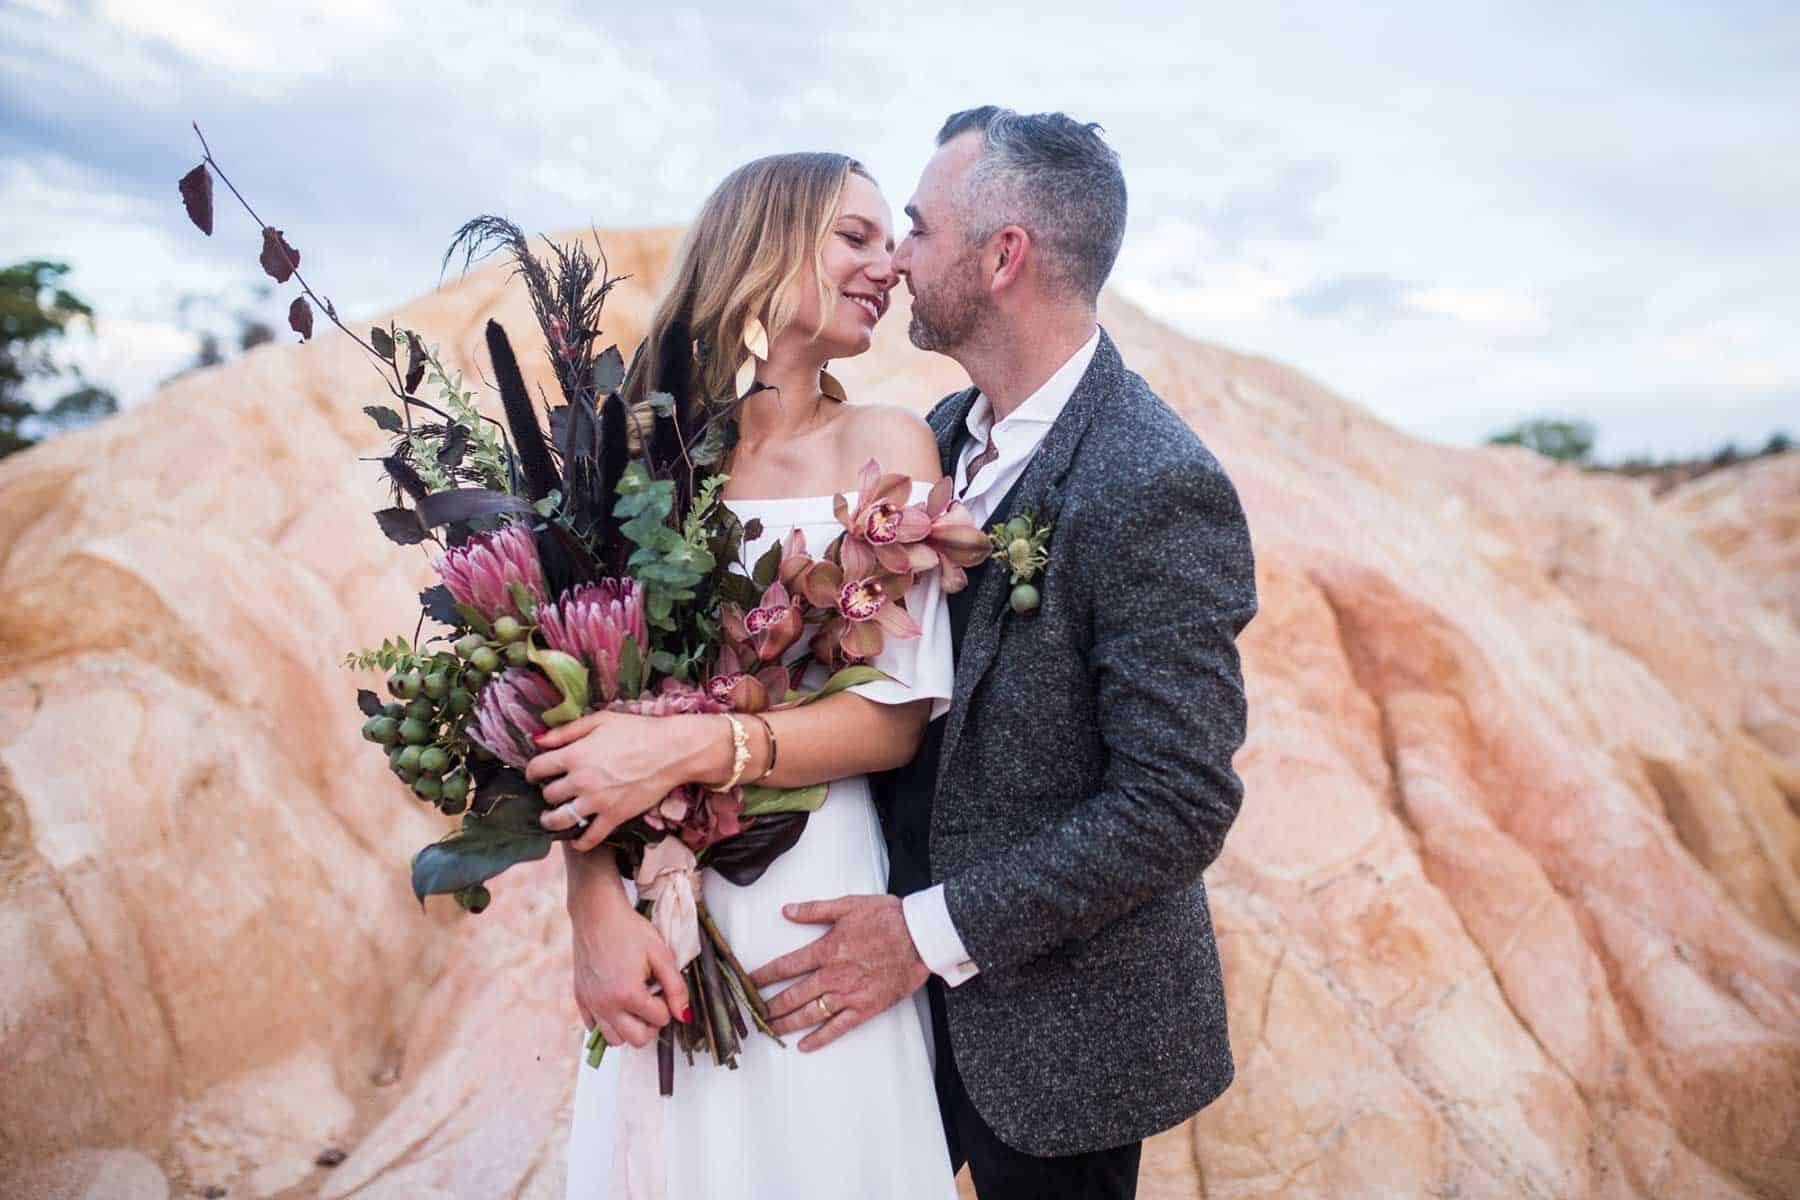 Sabine Legrand - elegant and timeless wedding photography, Melbourne